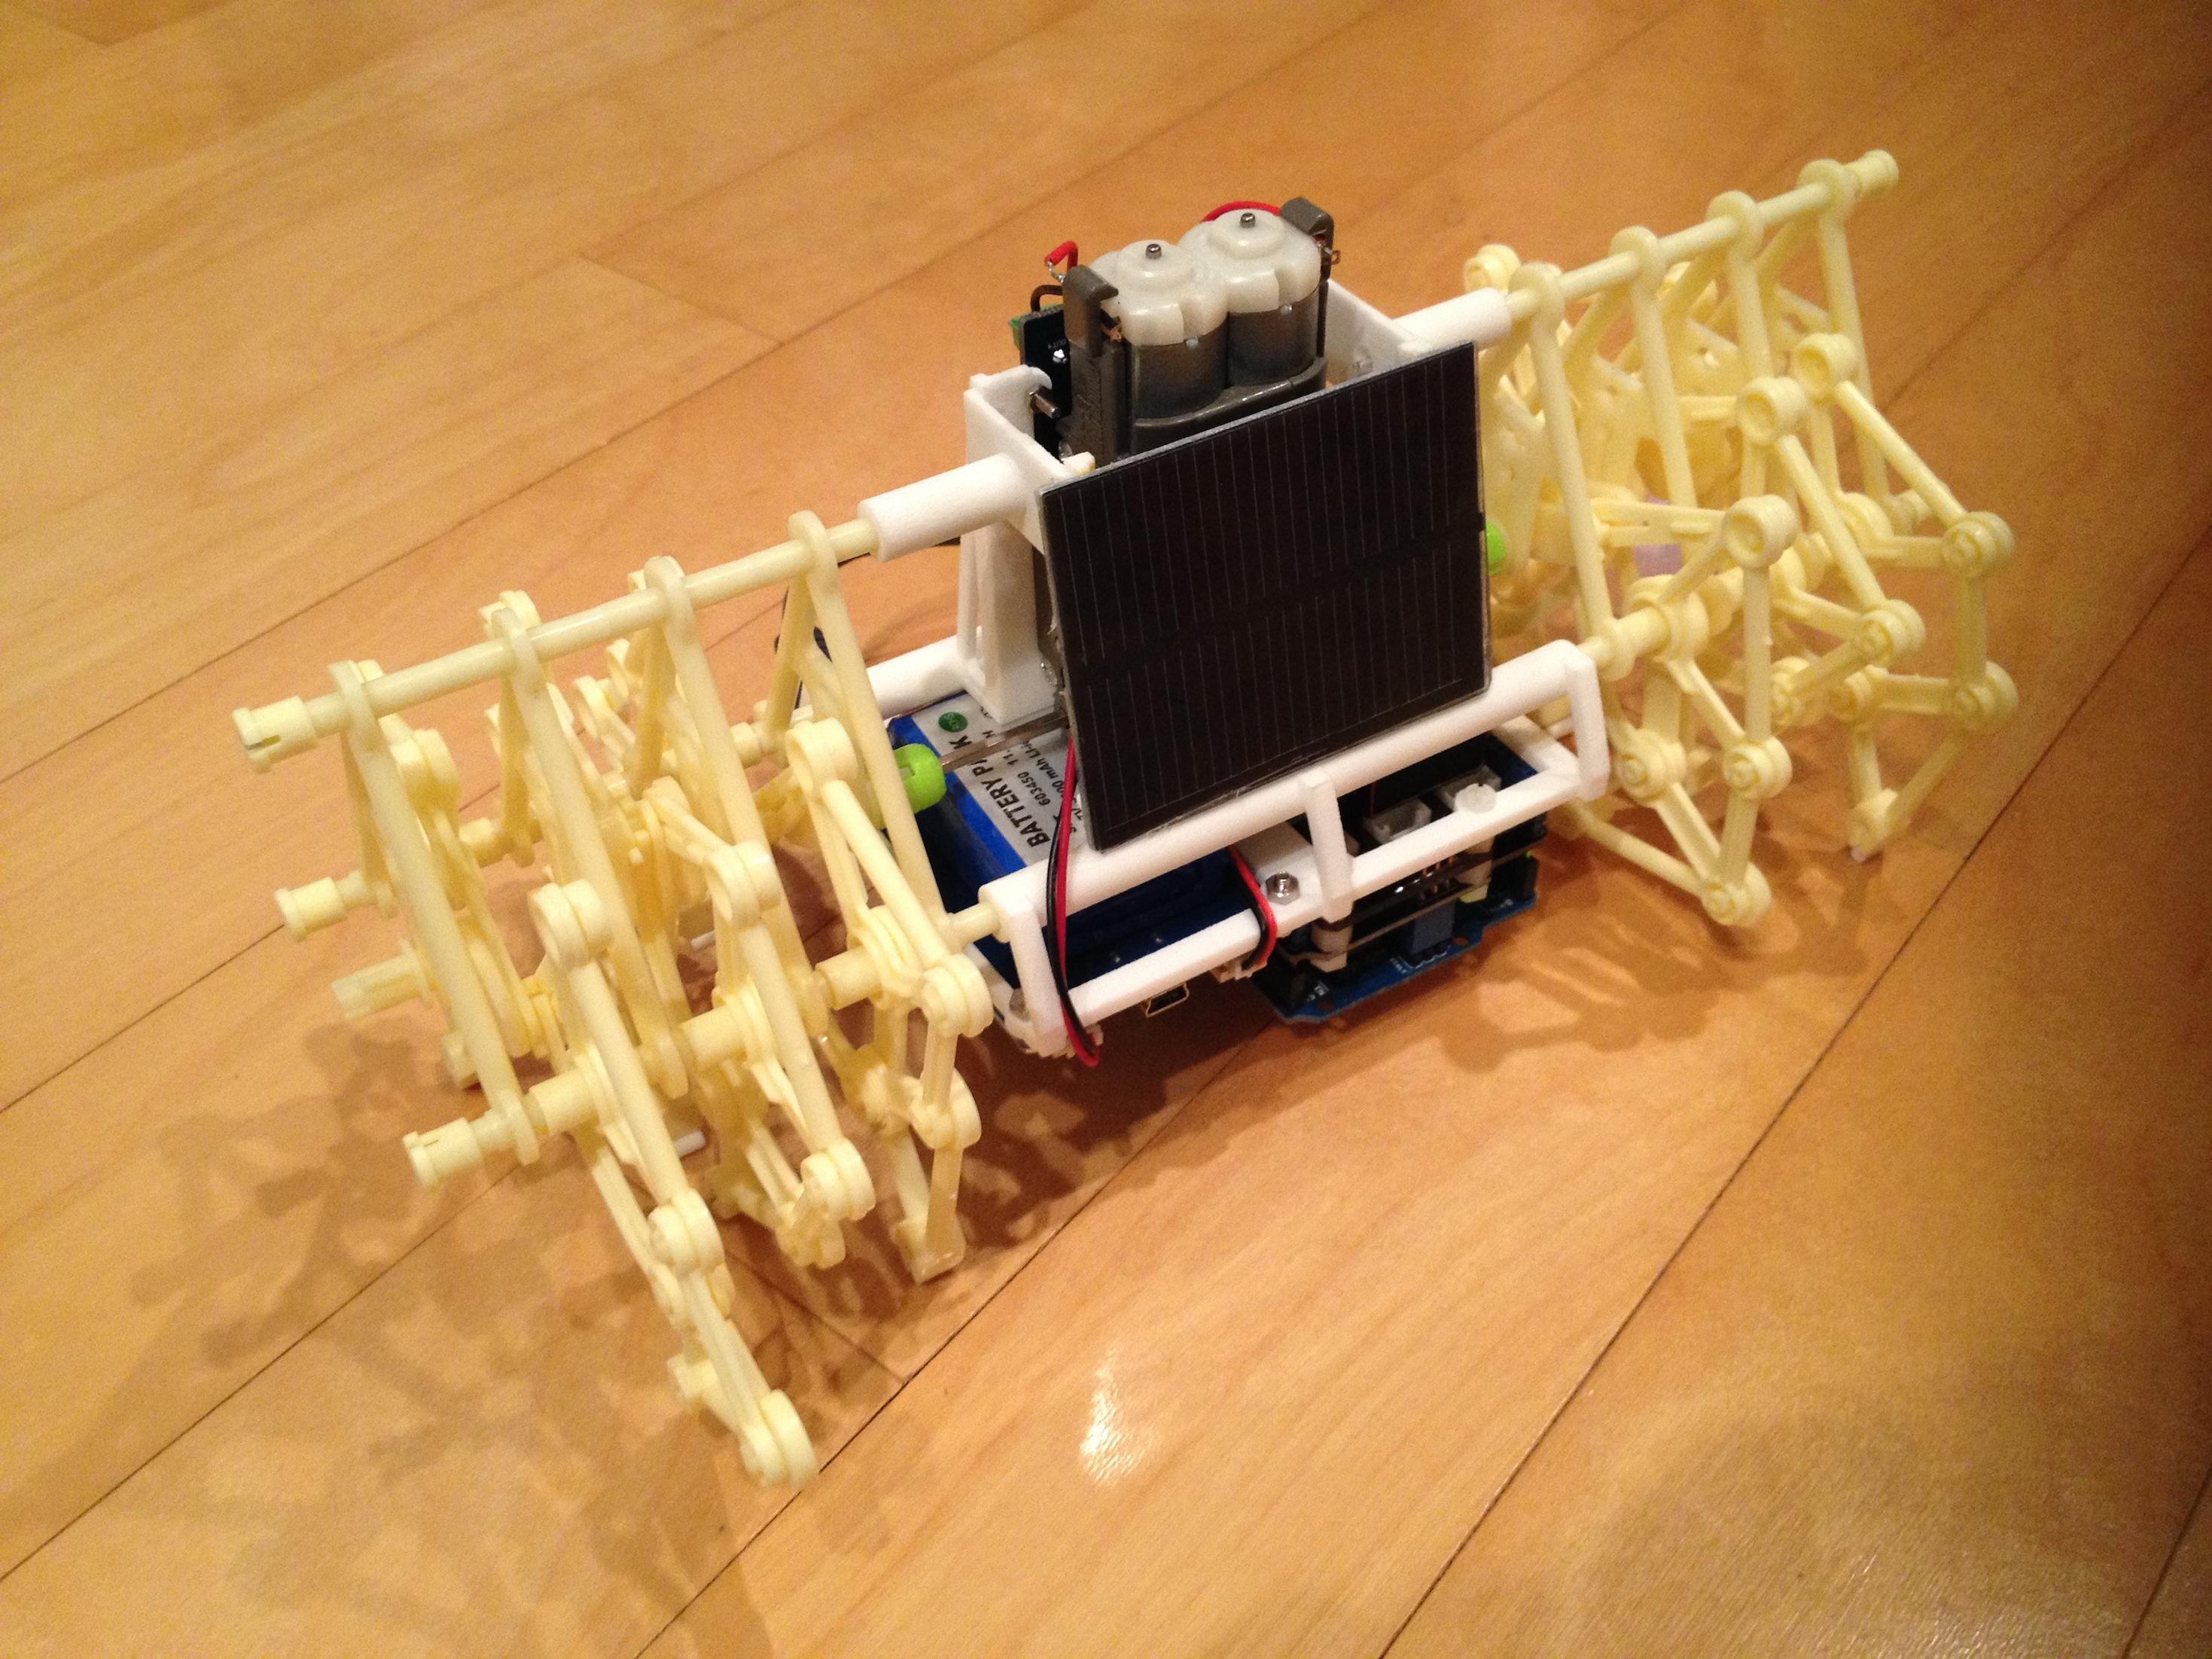 Strandbot - a solar & arduino powered R/C motorized Strandbeest